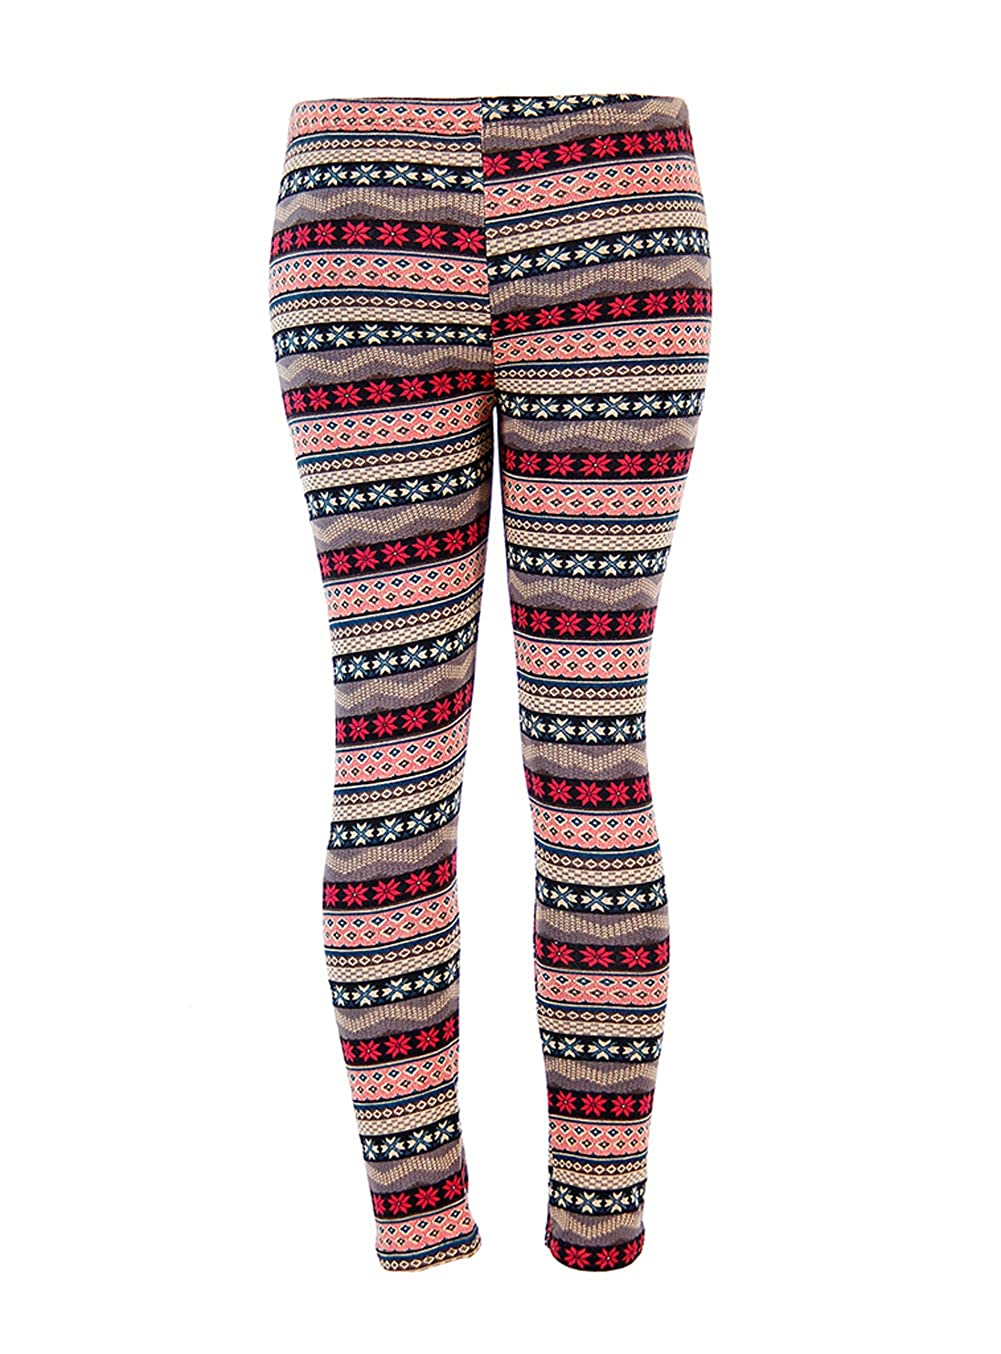 b682e10a18bdf6 Womens Christmas Warm Leggings Snowflake Reindeer Print Tights High Waist  Stretchy Long Pants at Amazon Women's Clothing store: